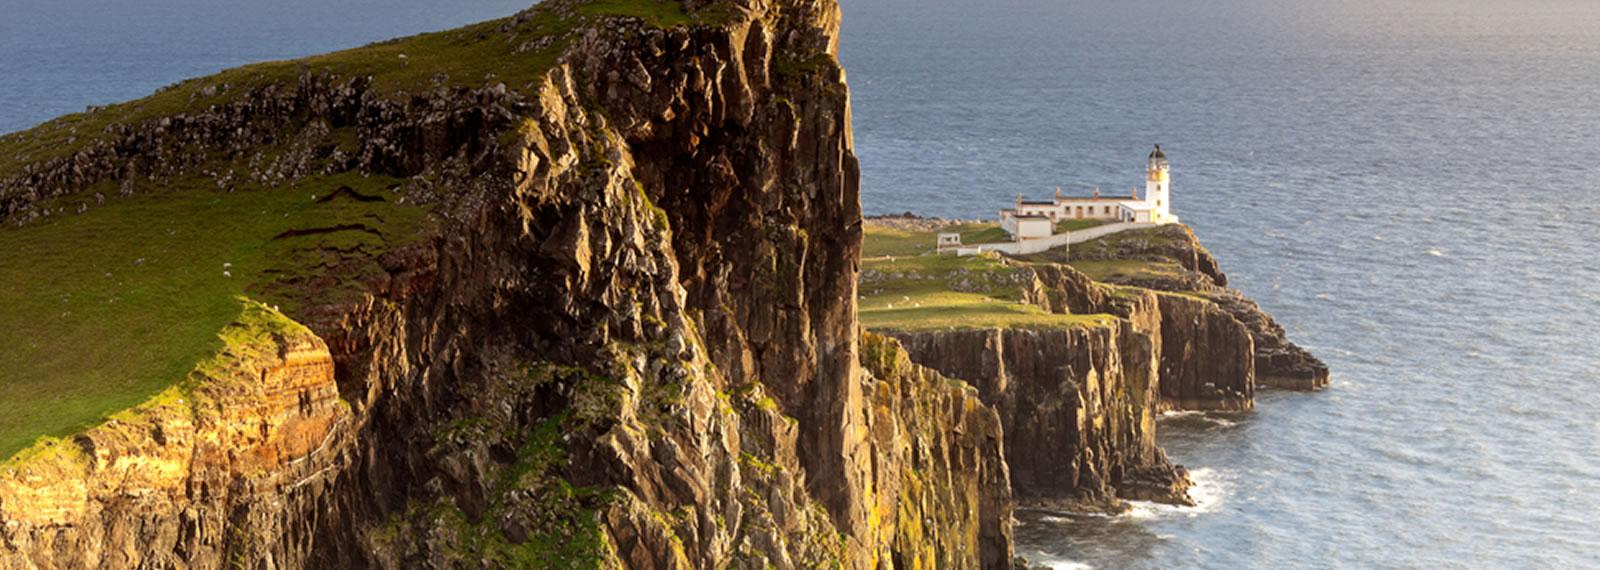 Retreat to the Isle of Skye